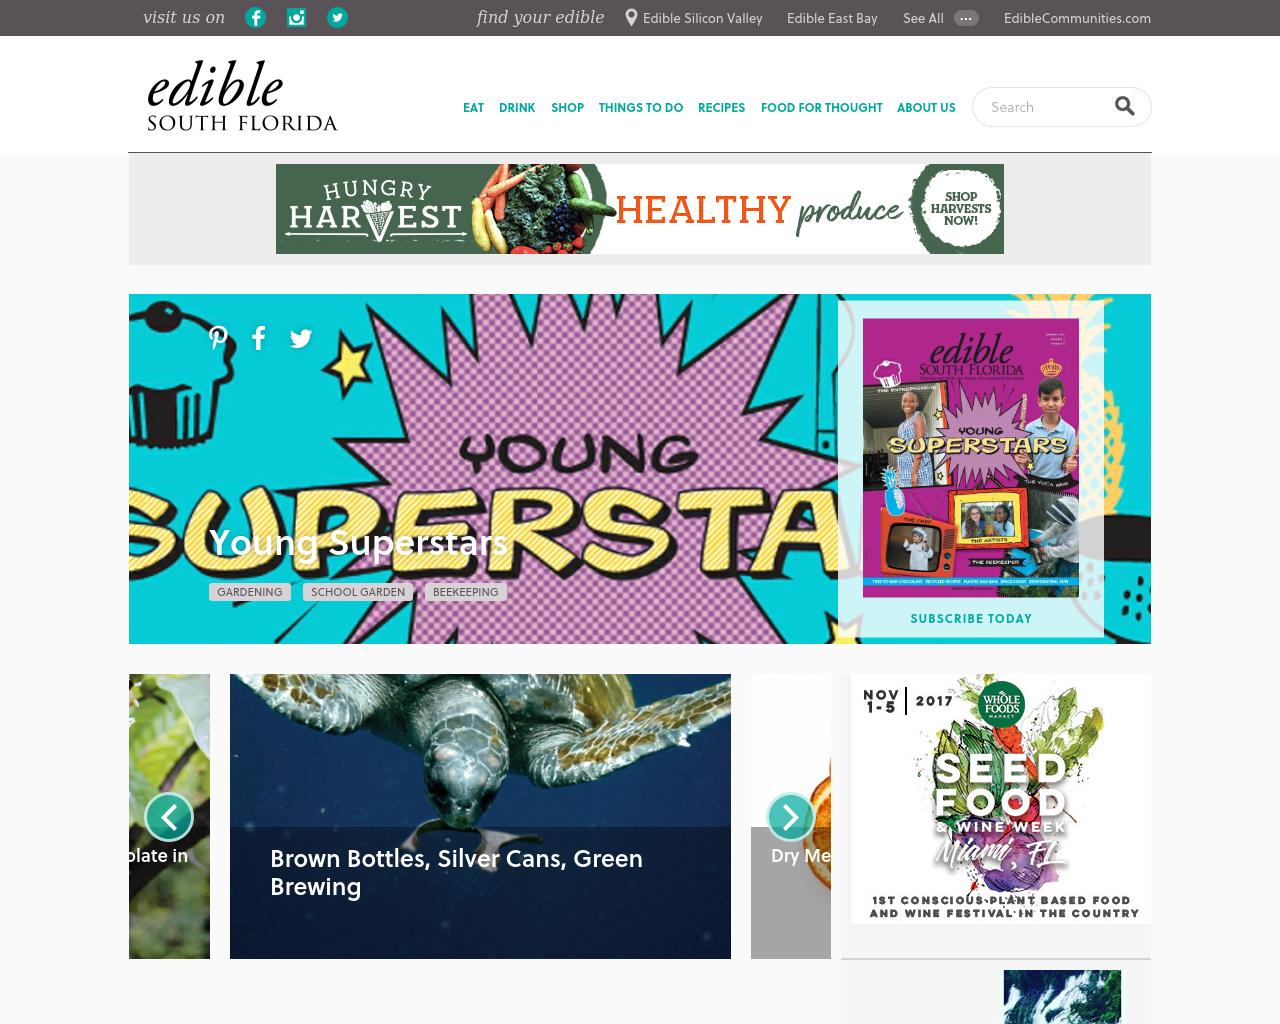 Edible-South-Florida-Advertising-Reviews-Pricing